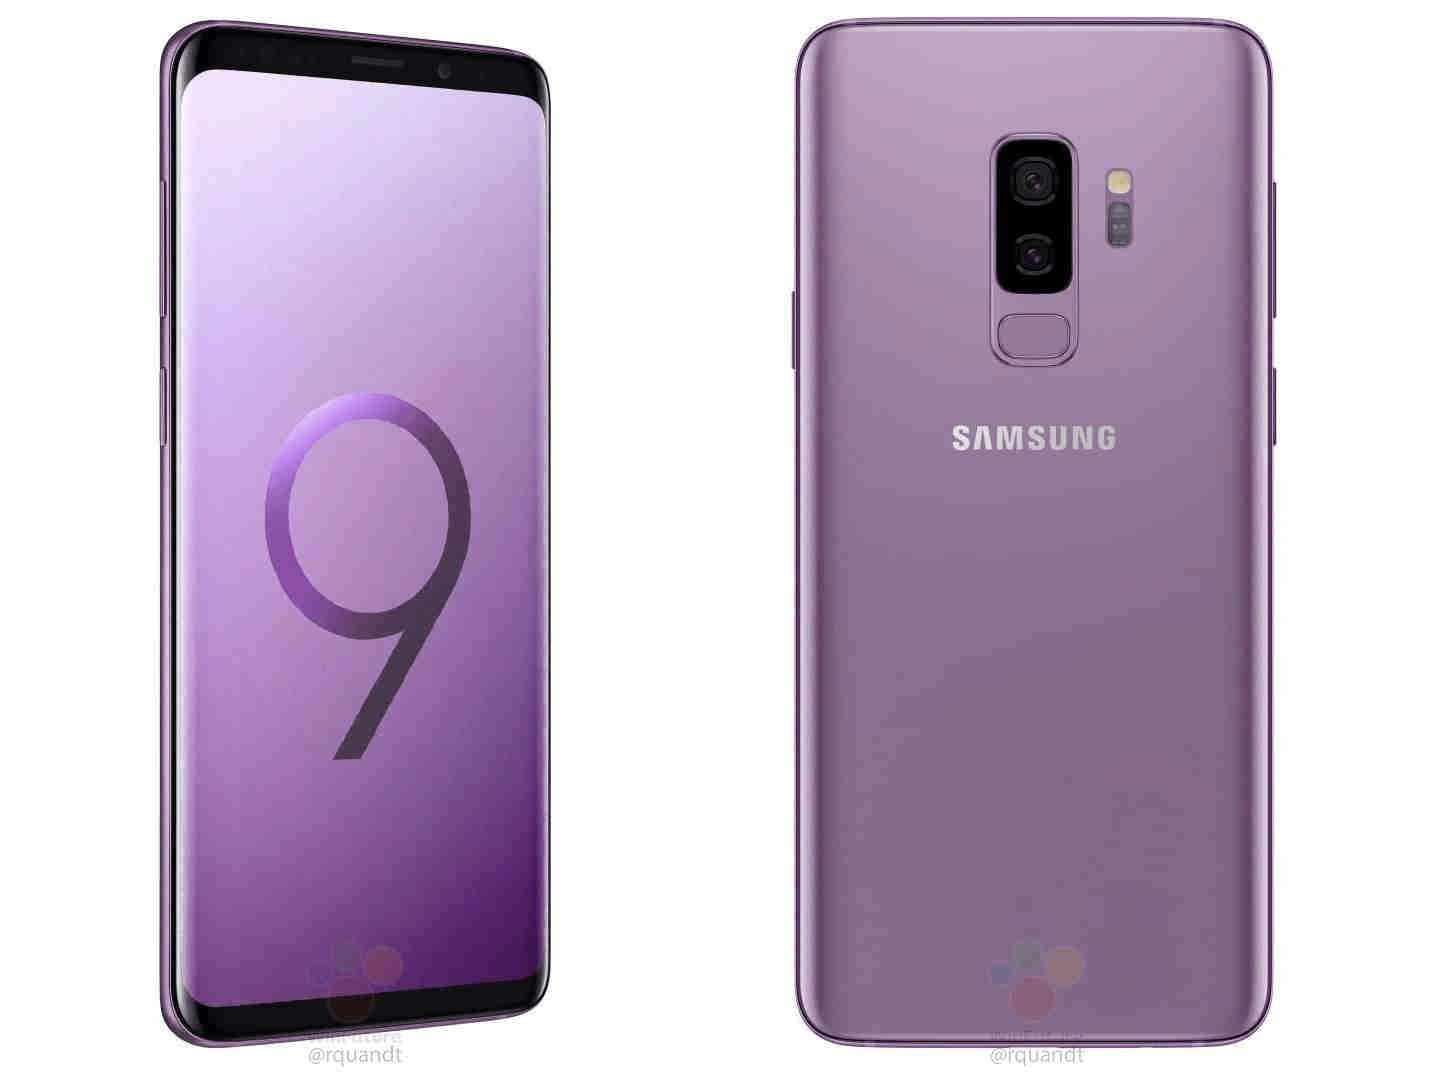 سامسونگ Samsung Galaxy S9 و Galaxy S9 Plus